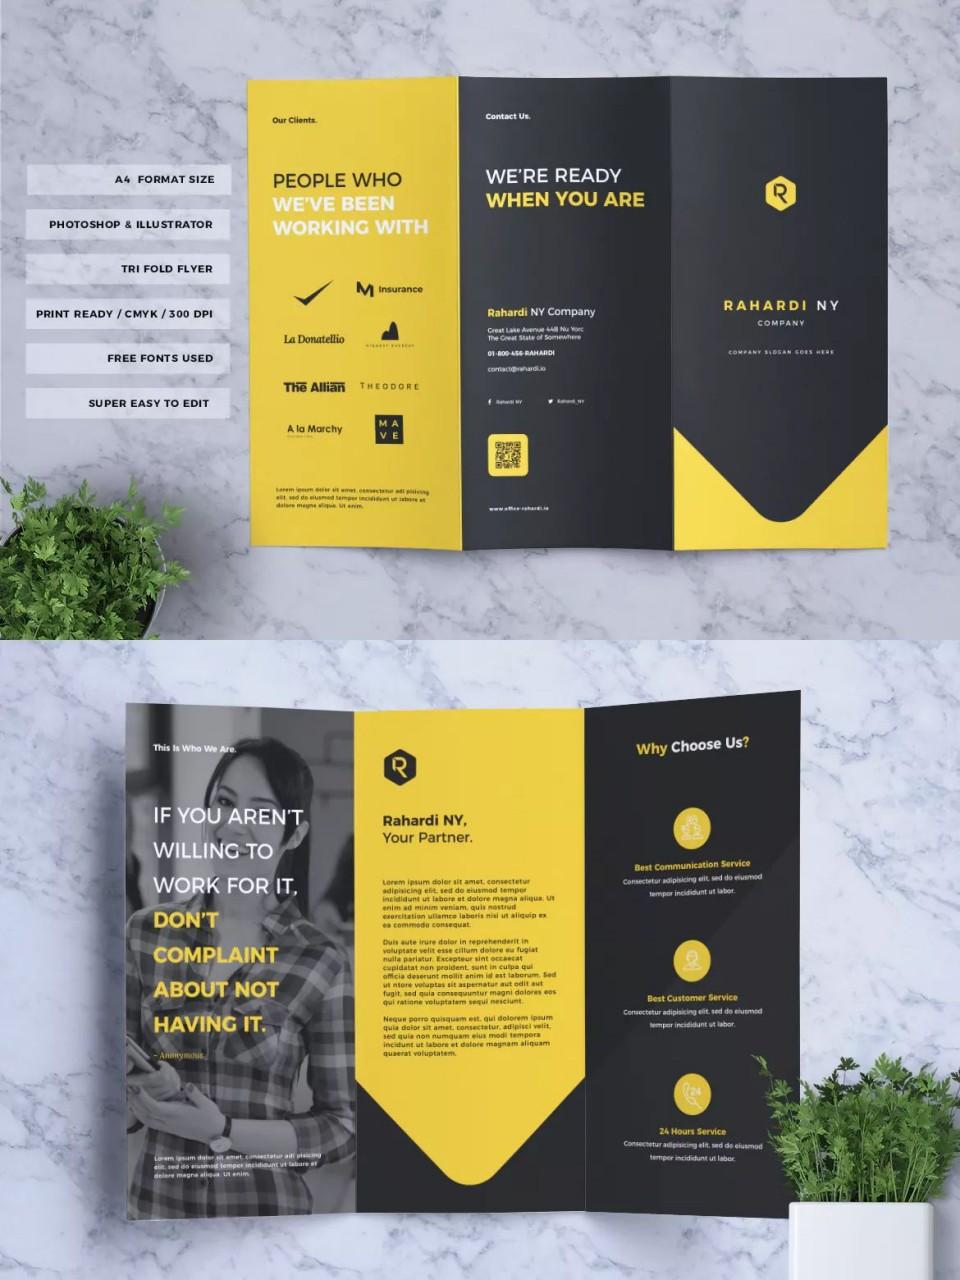 004 Sensational Three Fold Brochure Template Psd High Resolution  Free 3 A4 Tri Download960